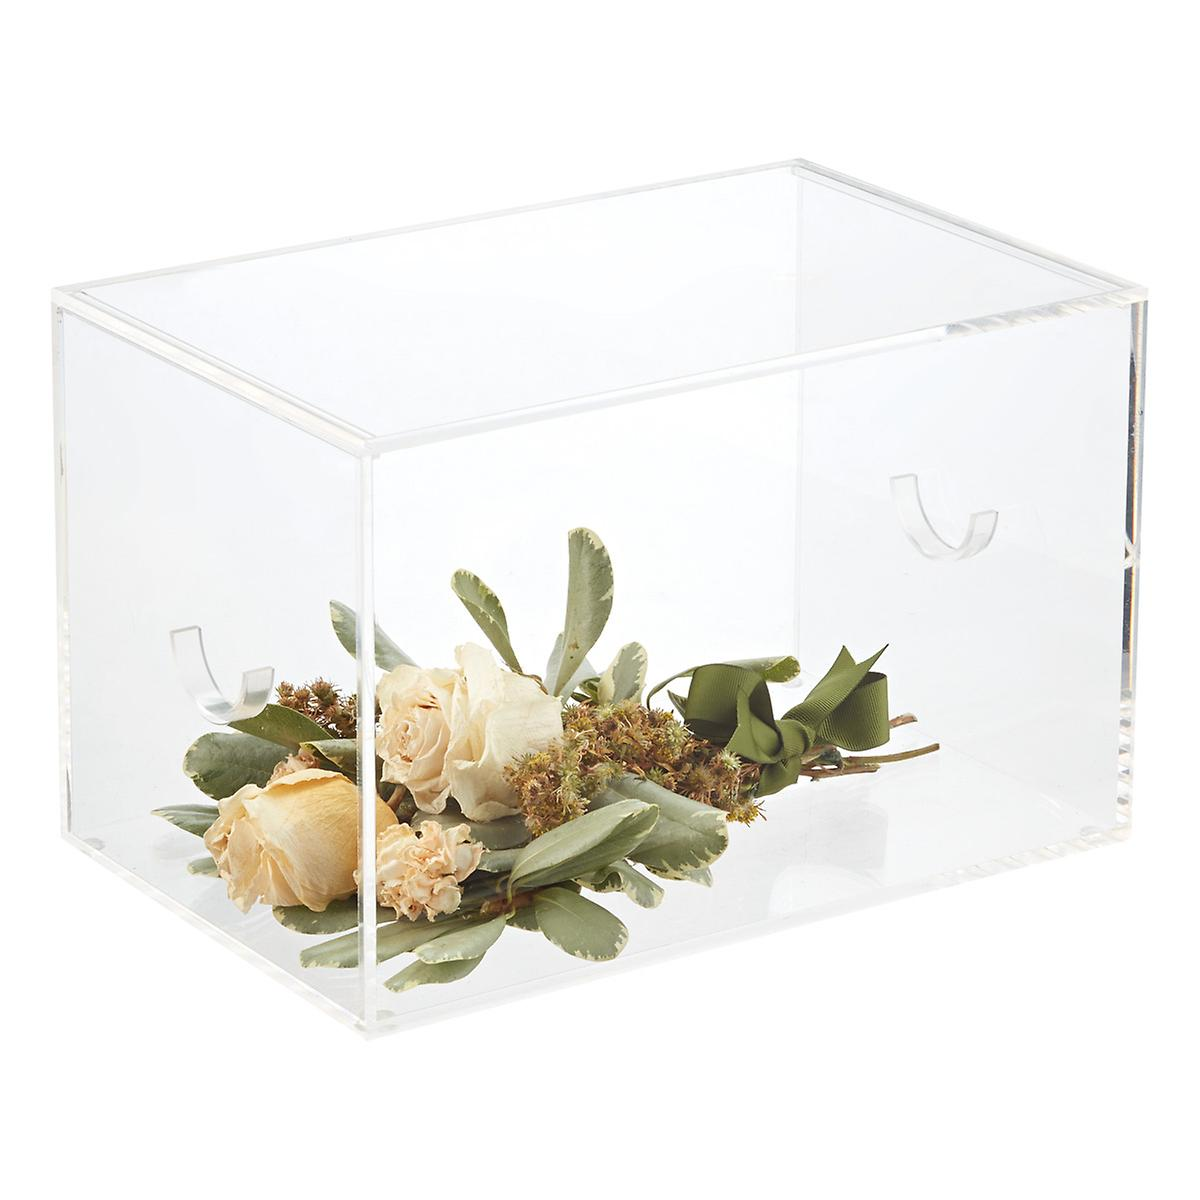 Acrylic Football Premium Display Cube